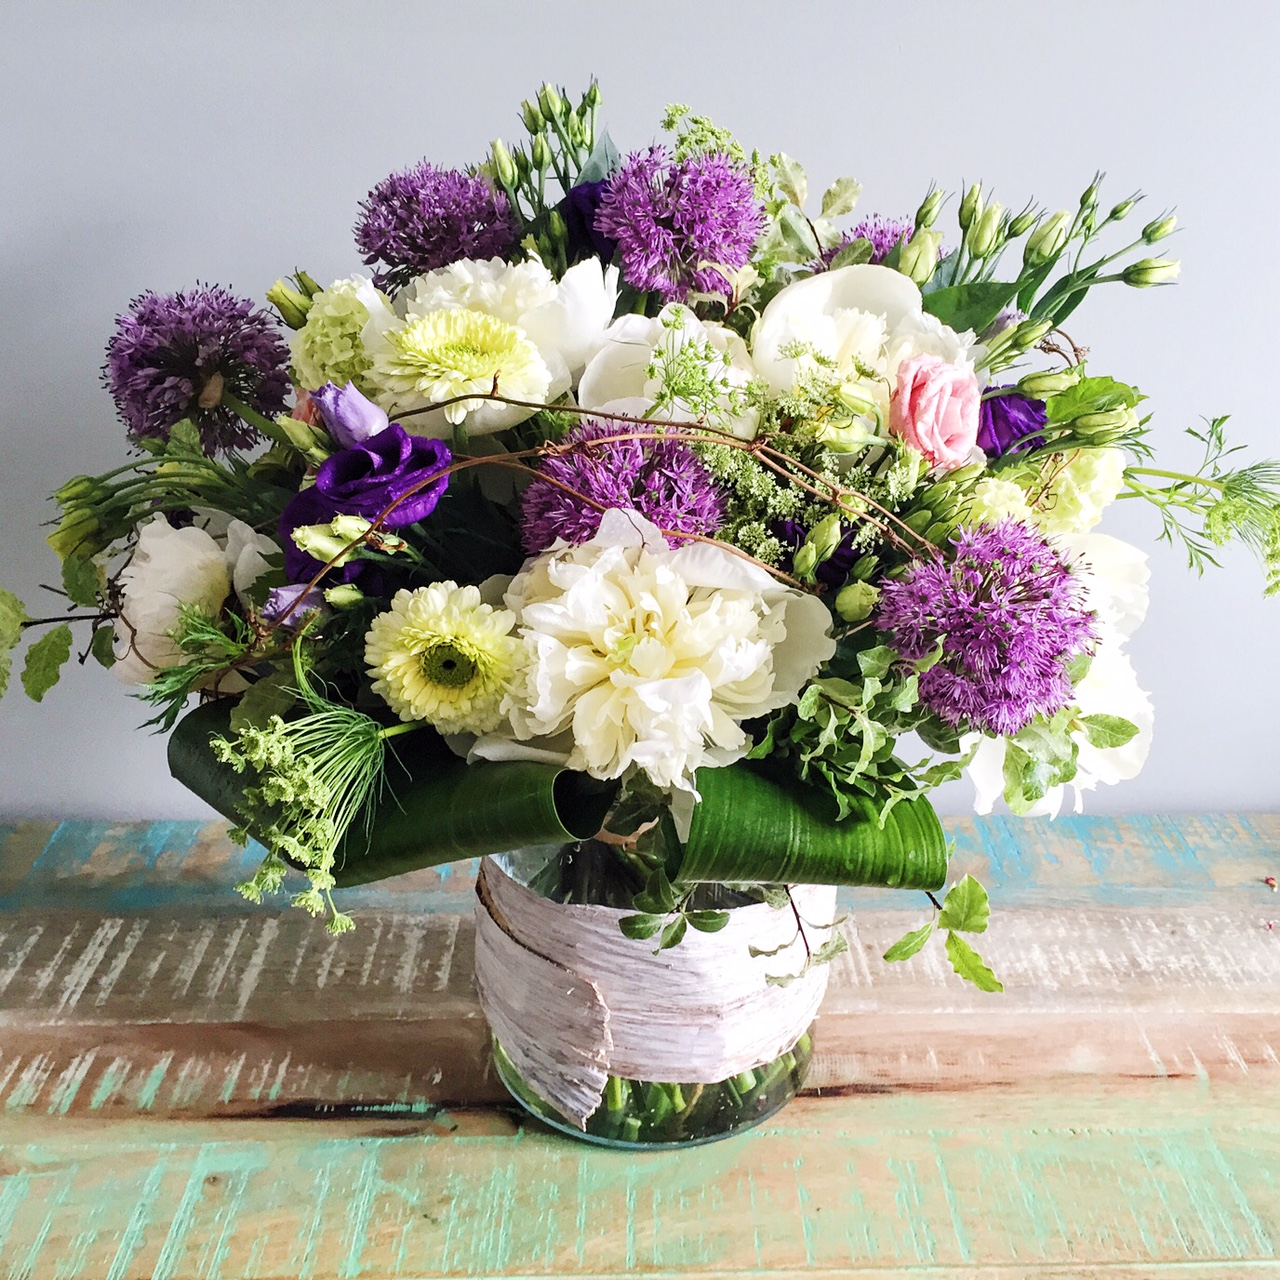 bouquetIMG_6611.JPG